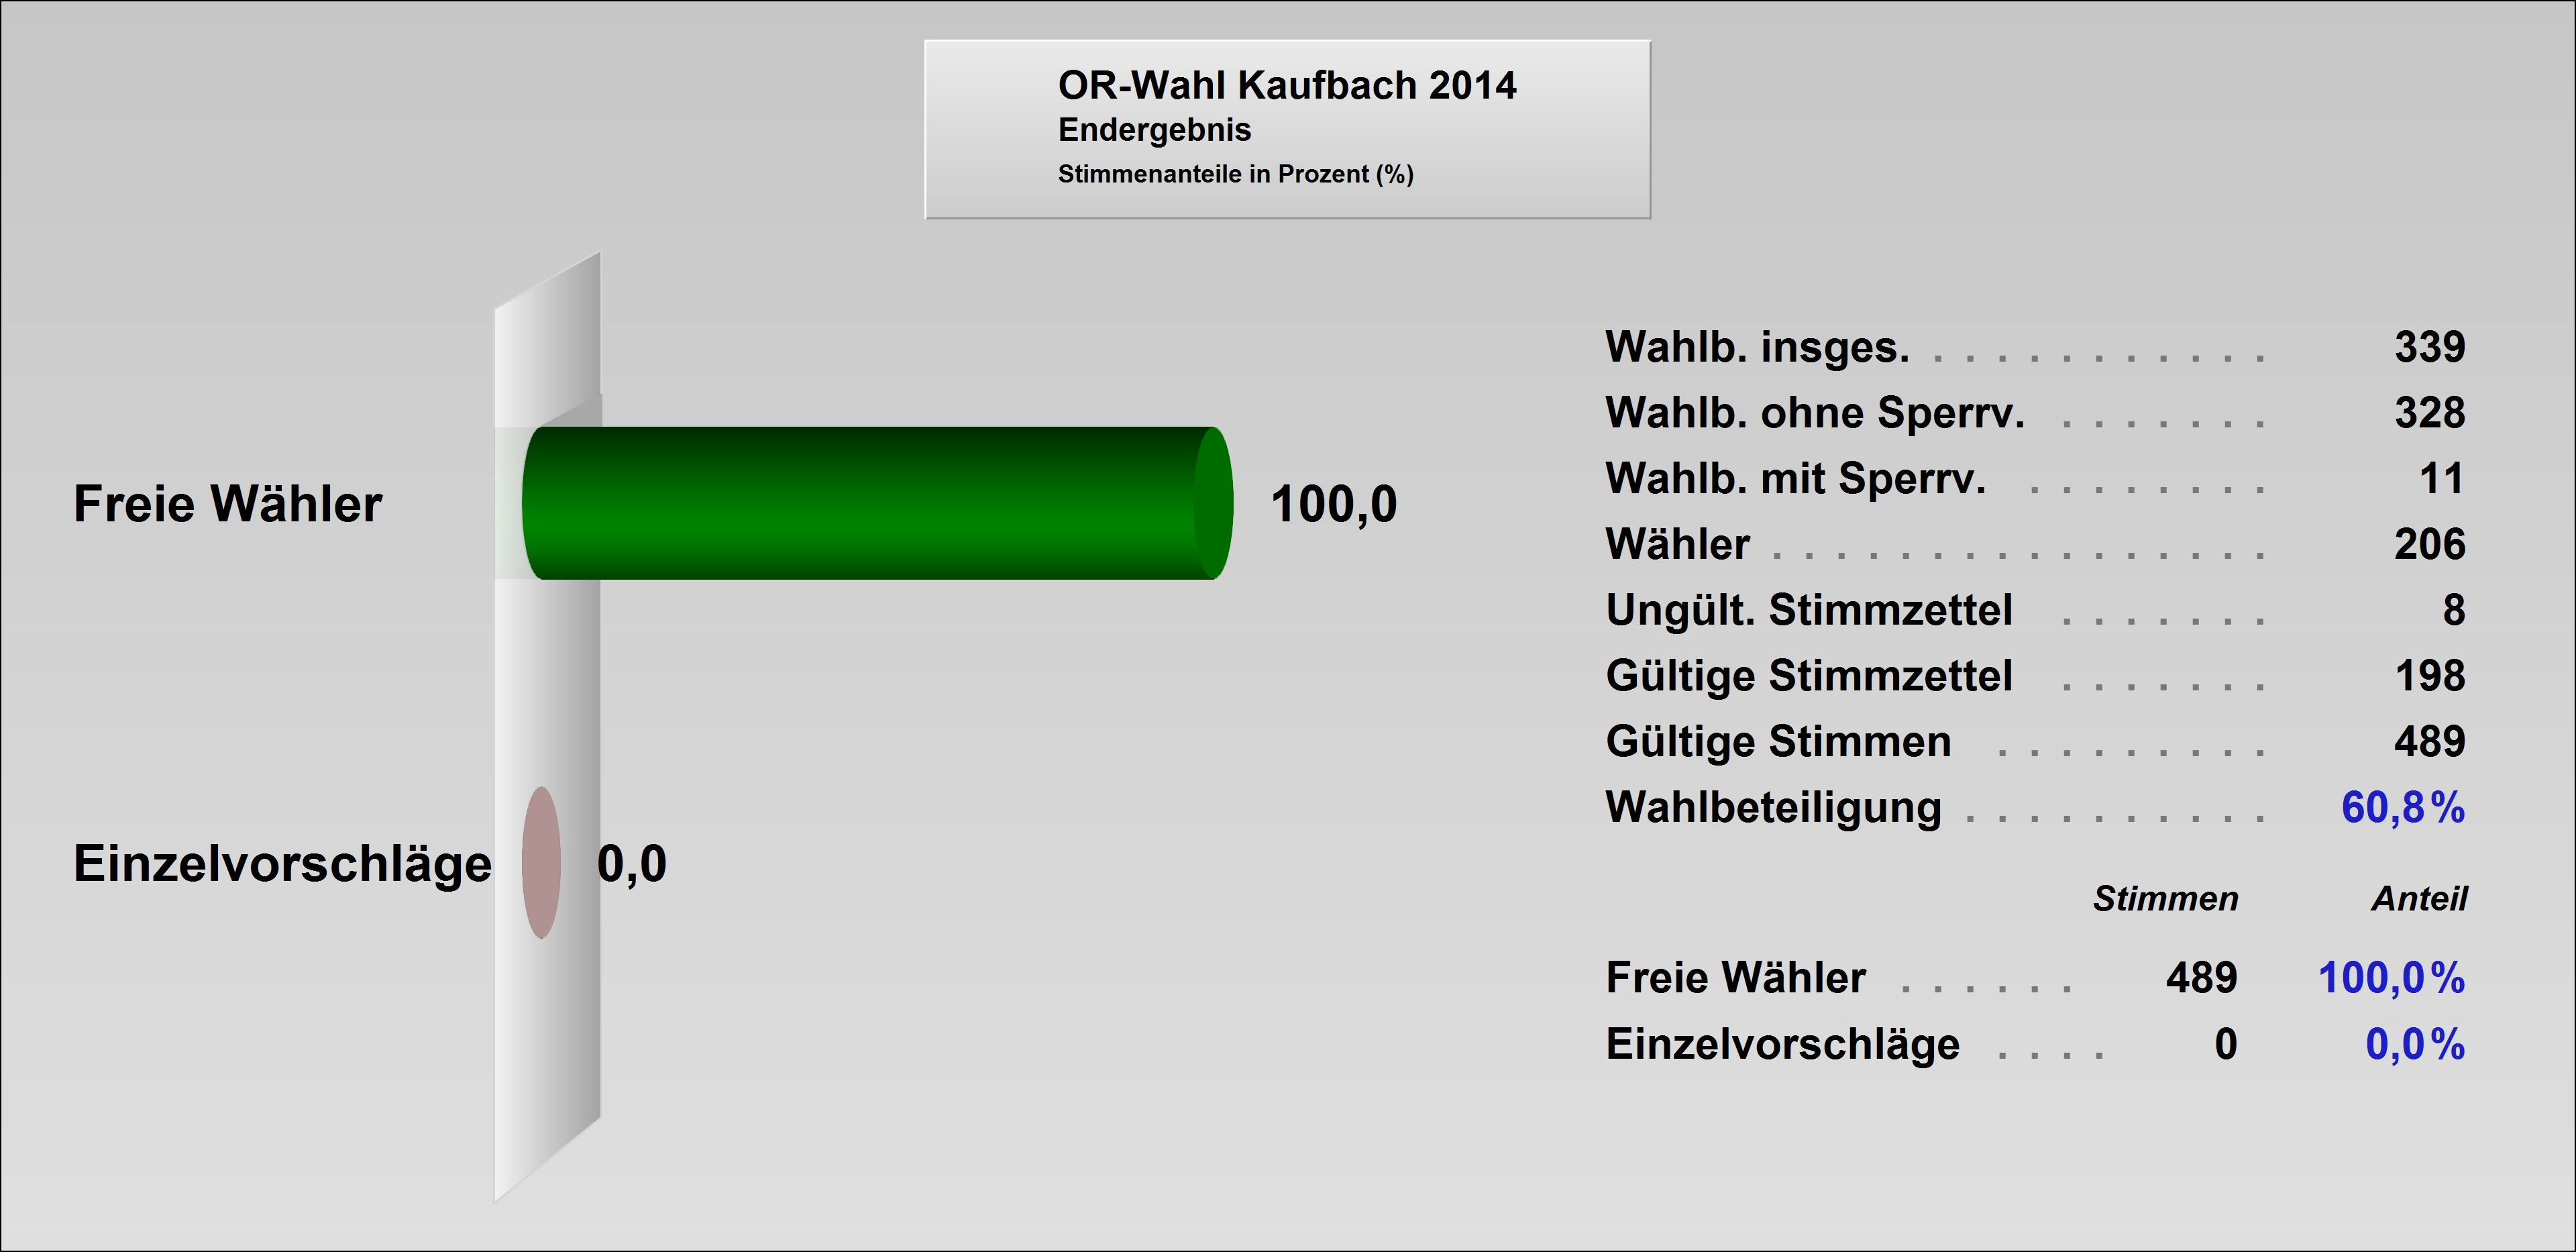 ORat2014-Kaufbach.jpg